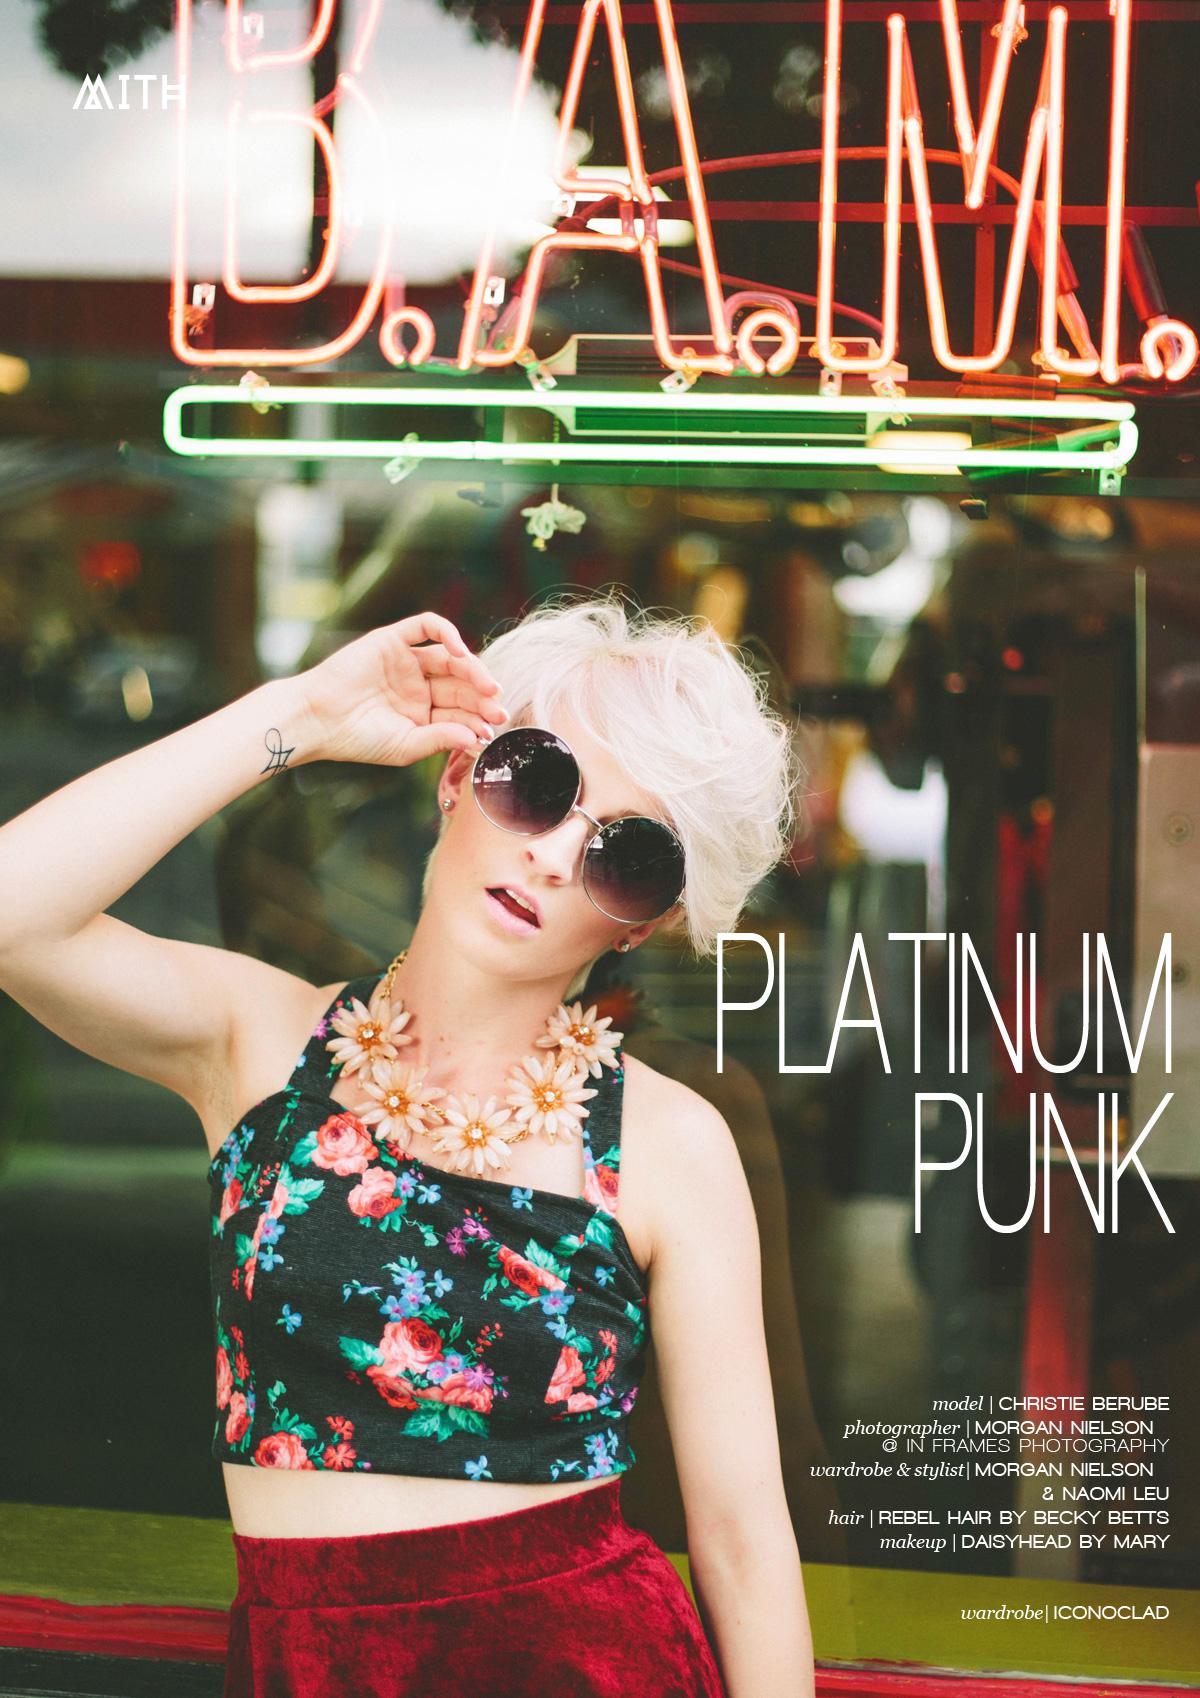 MITH_platinum-punk_christie-berube_morgan-nielson_web01